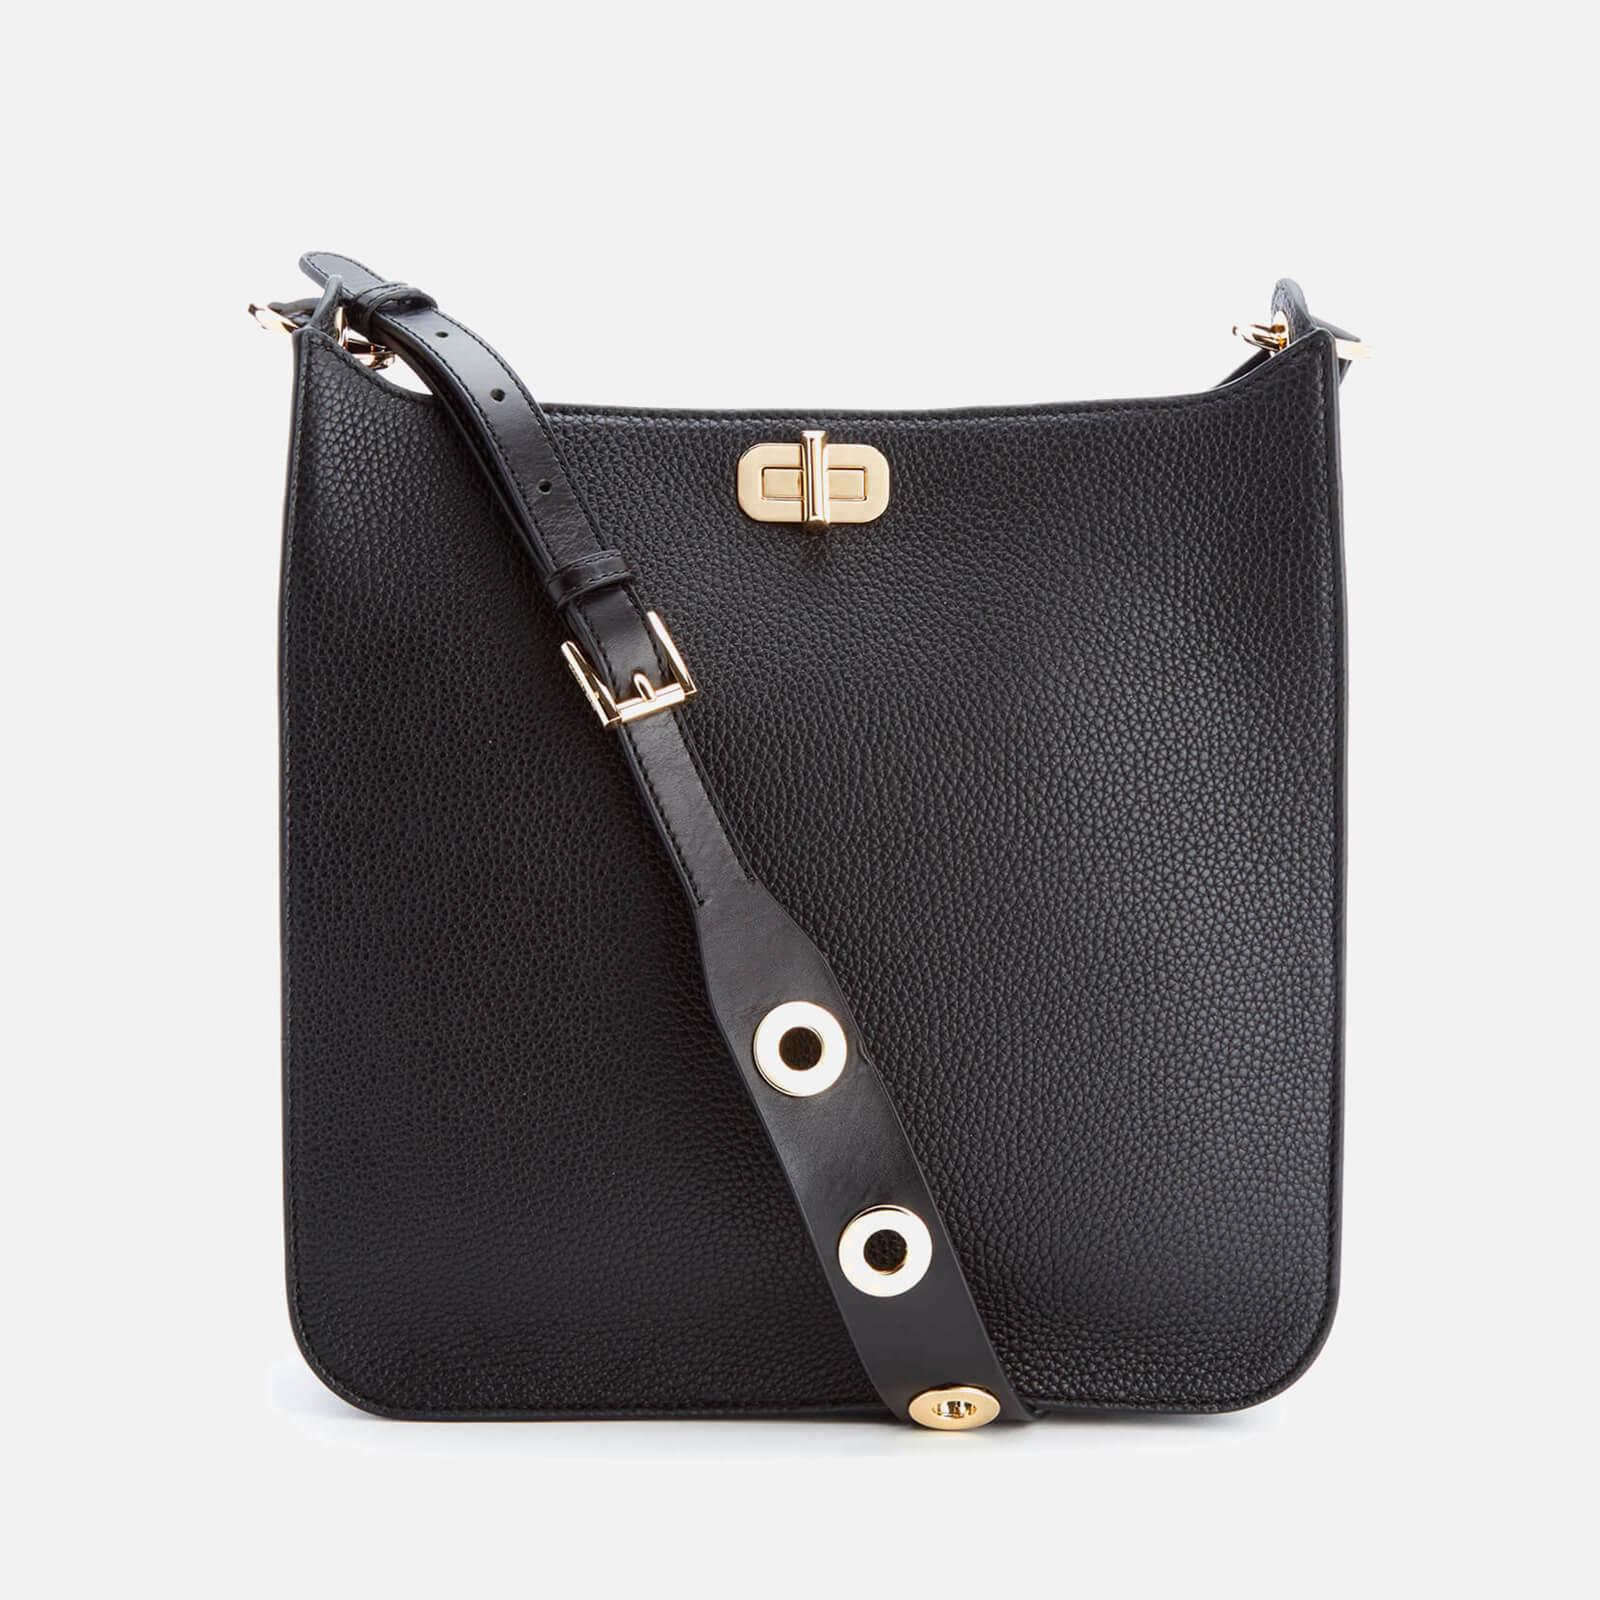 13aa6b5f3a4a ... MICHAEL MICHAEL KORS Women s Sullivan Large North South Messenger Bag -  Black